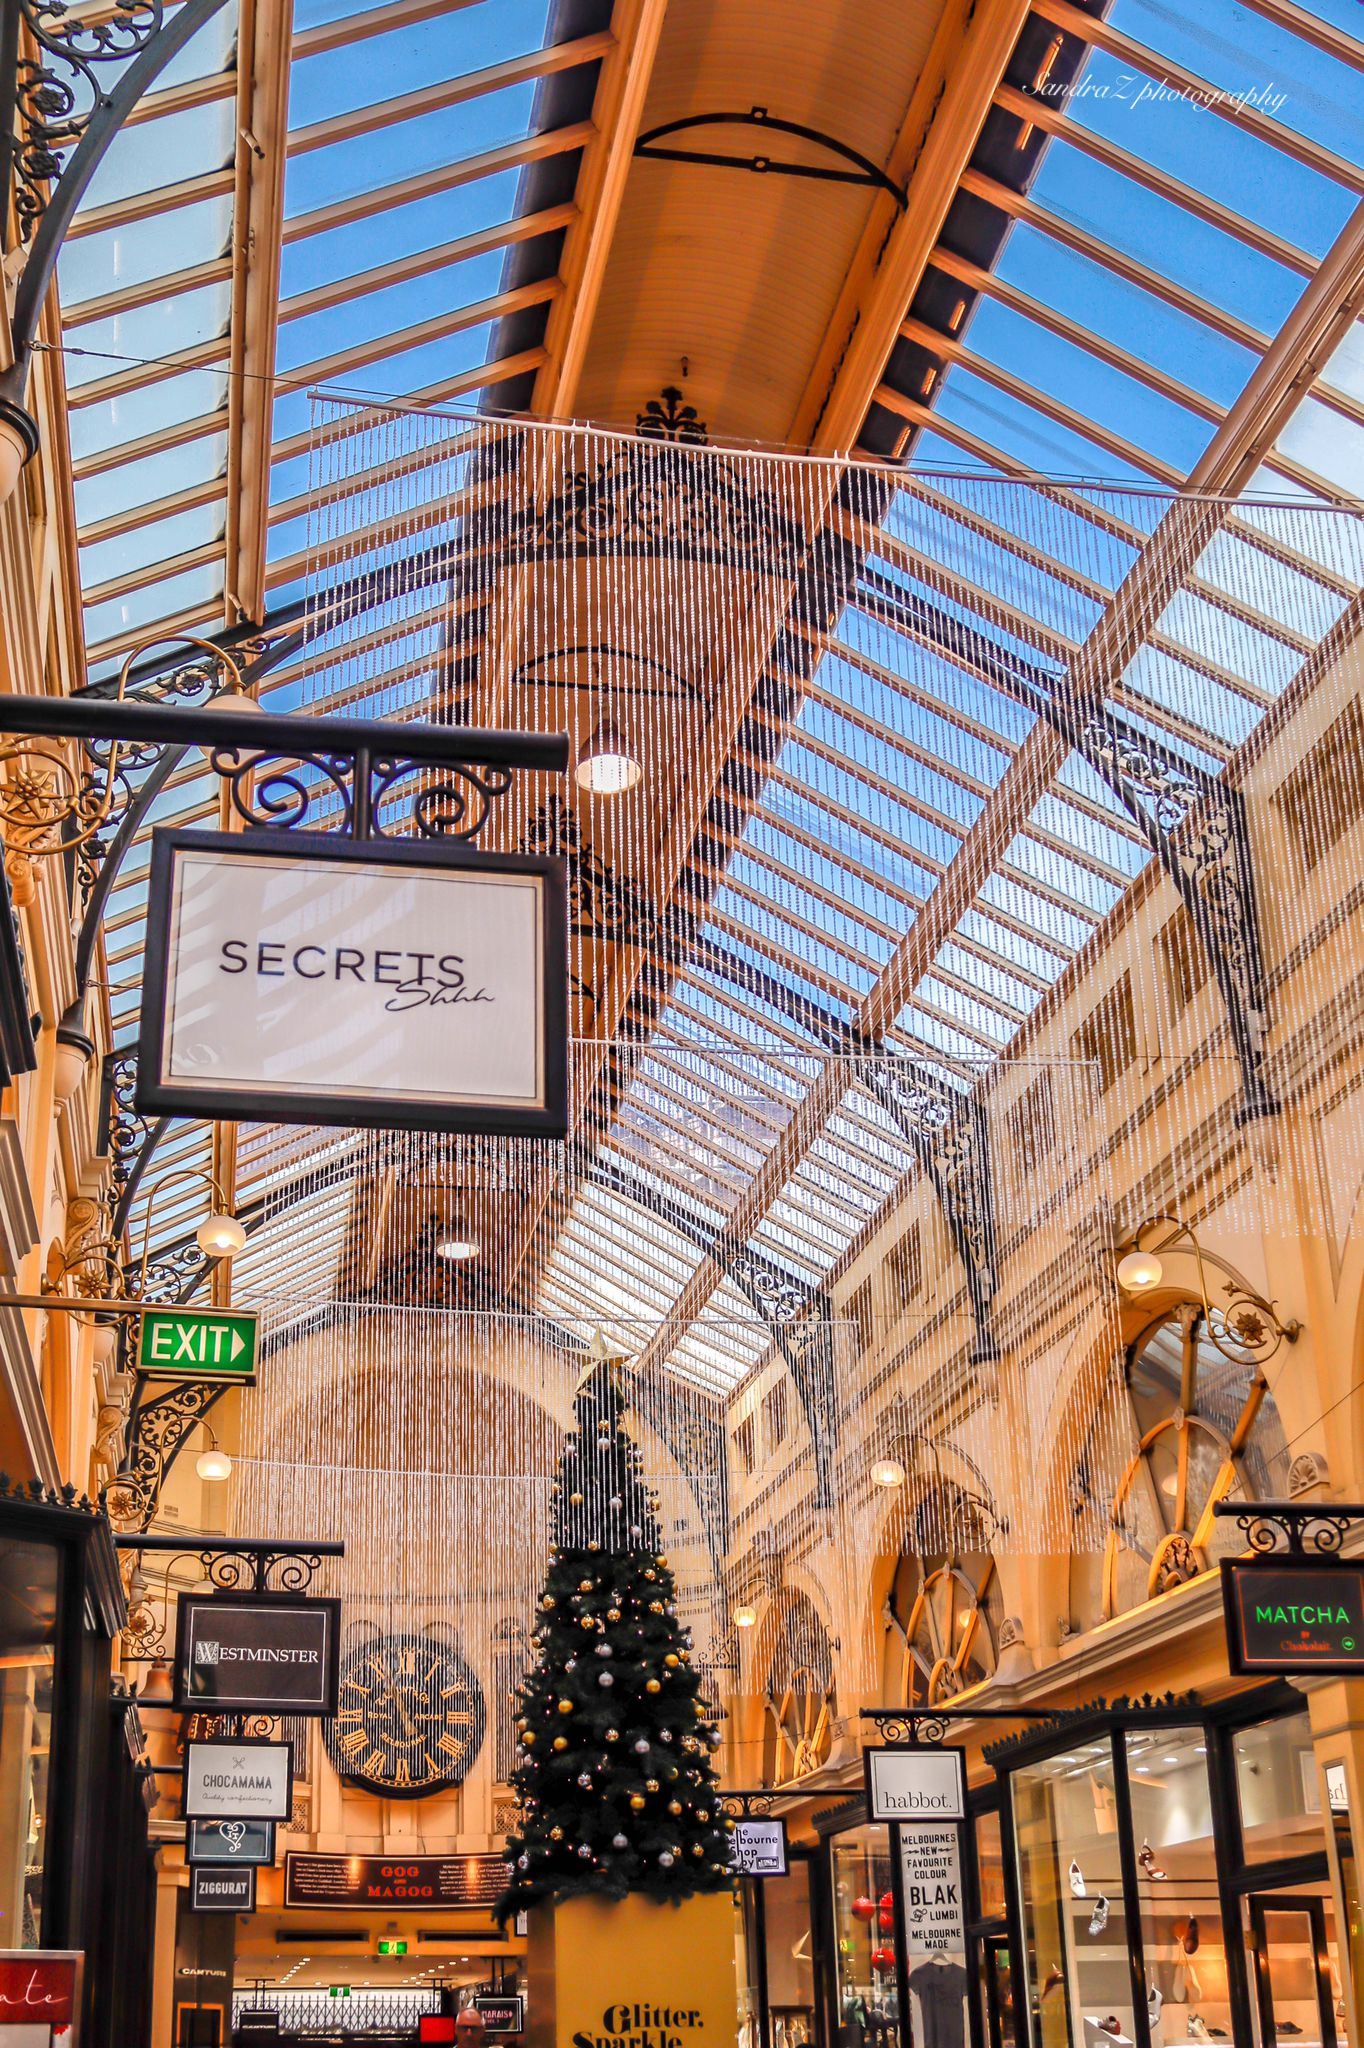 Broadway Shows Christmas 2019 Block Arcade Christmas/SandraZ | Melbourne in 2019 | Melbourne